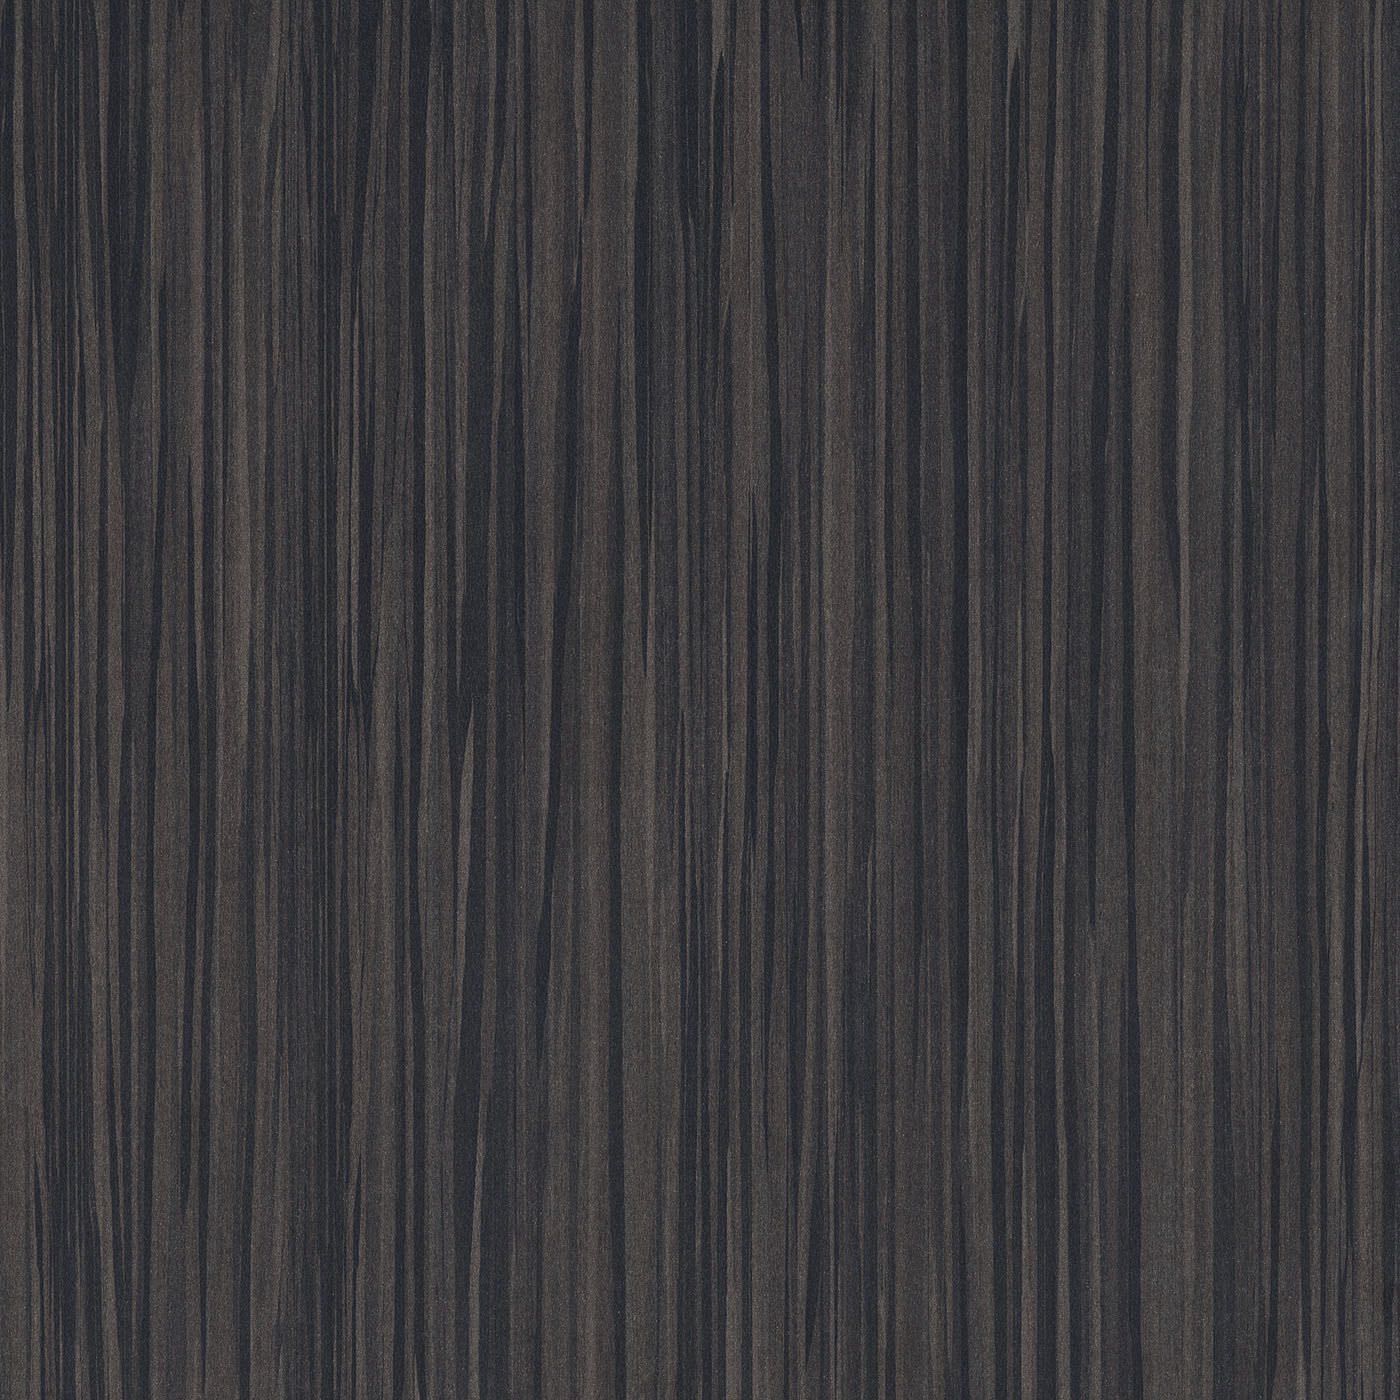 Wood Look Decorative Laminate Polished Matte Hpl Autumn Odyssey